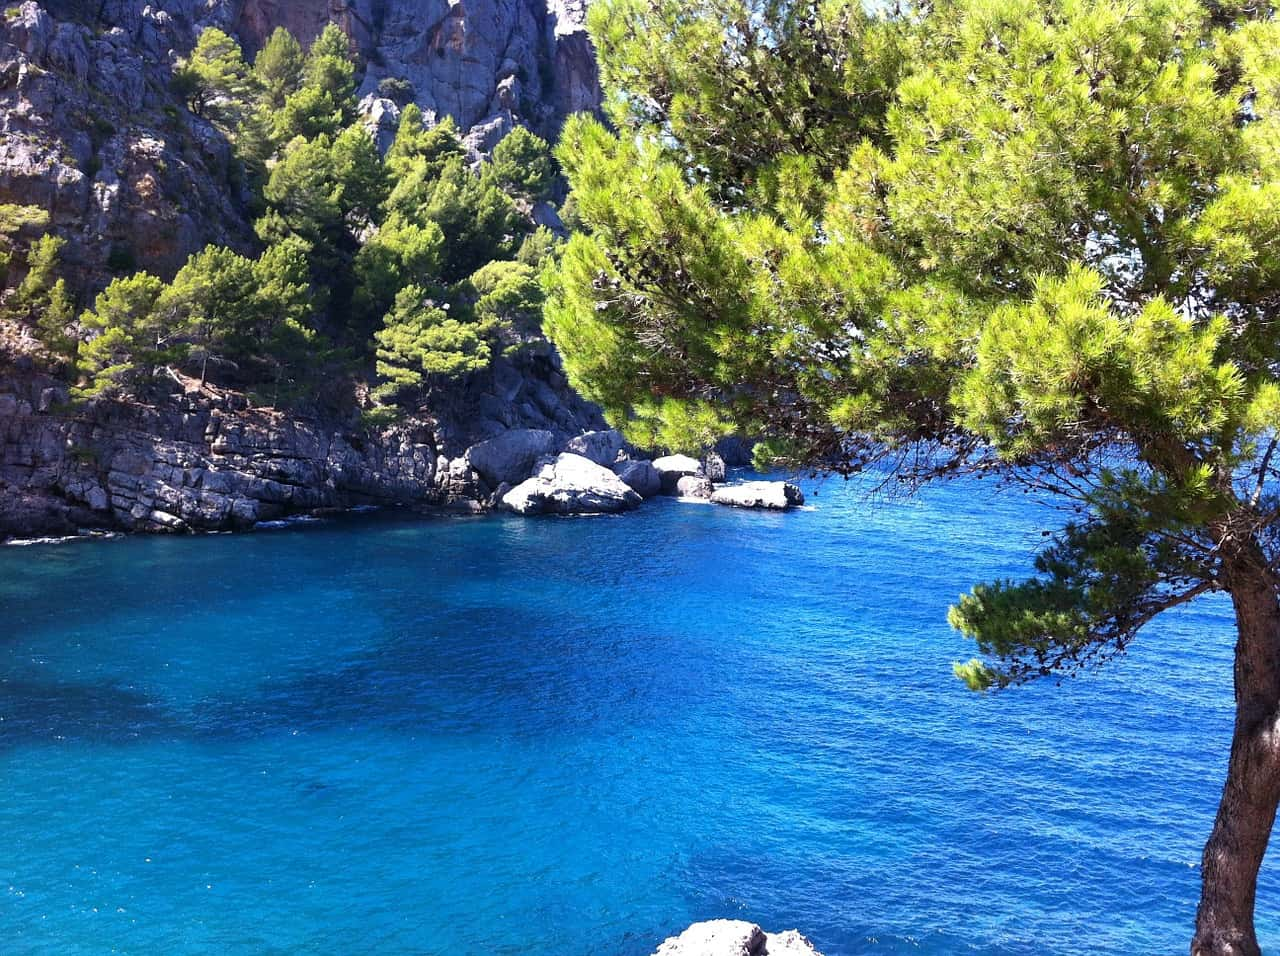 Malle Deals ab 174,00€ - Mallorca Urlaub Cala Ratjada im Sale